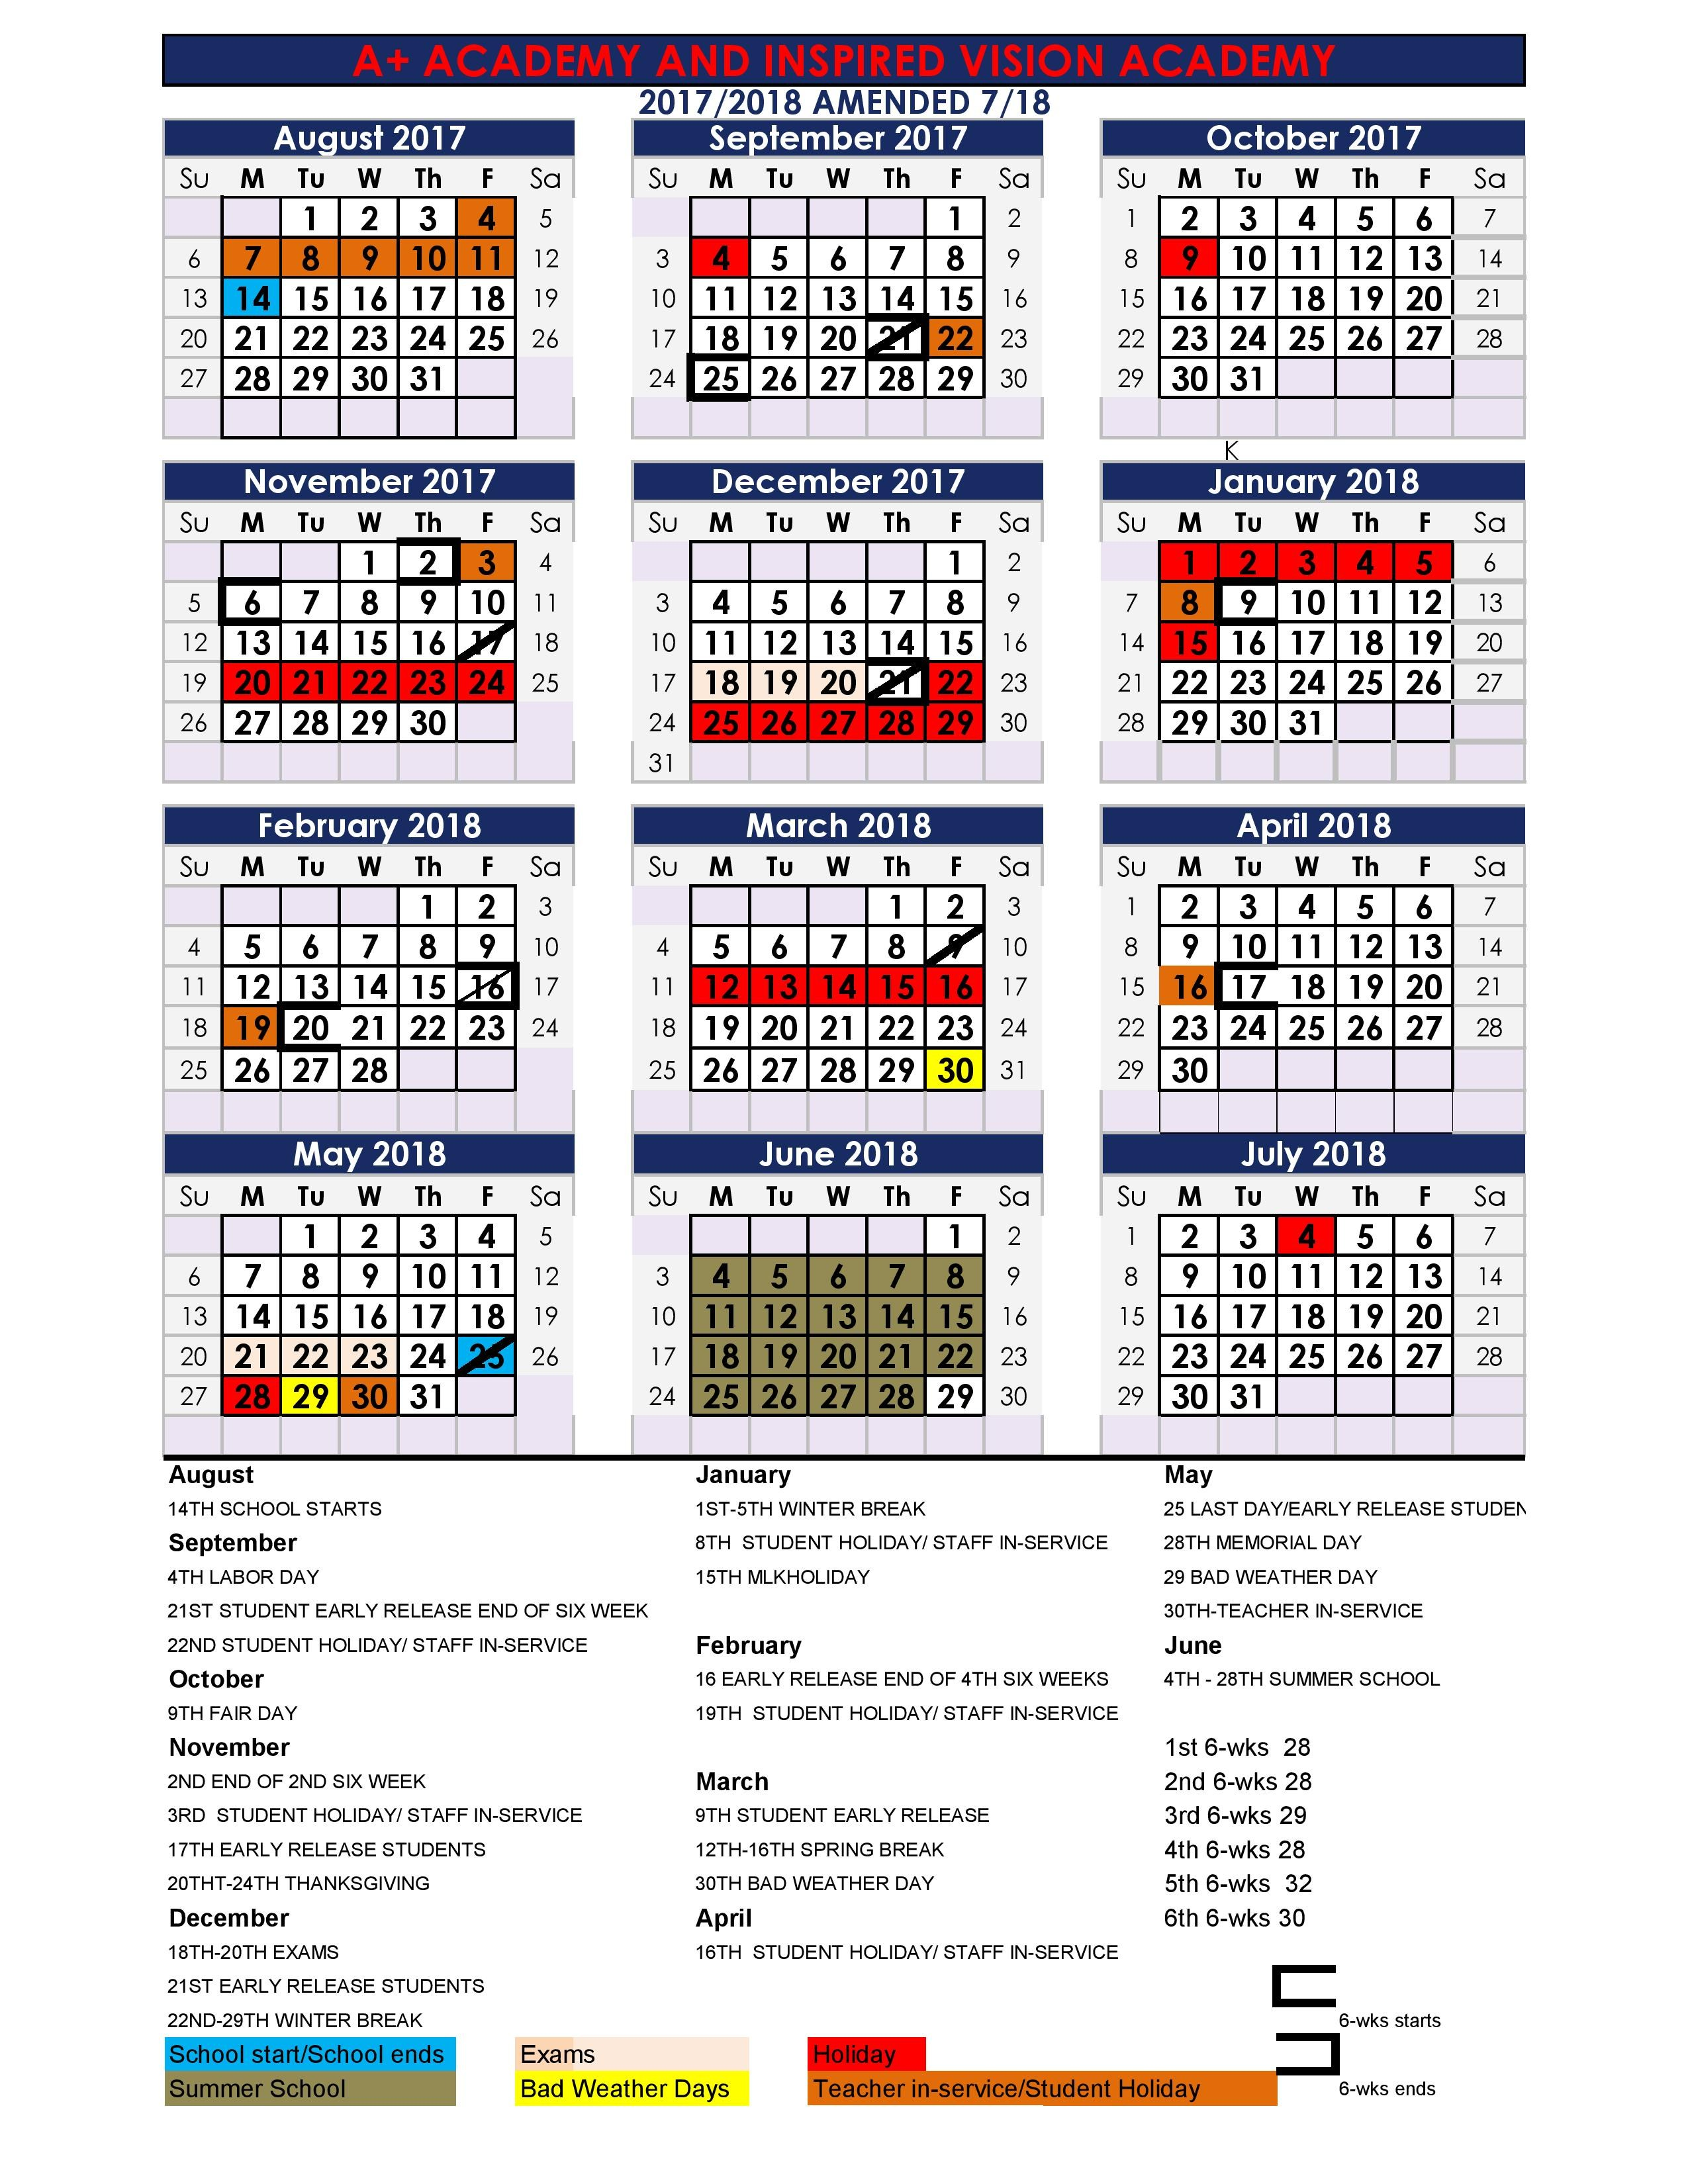 district calendar 2017 2018 - When Does School Start After Christmas Break